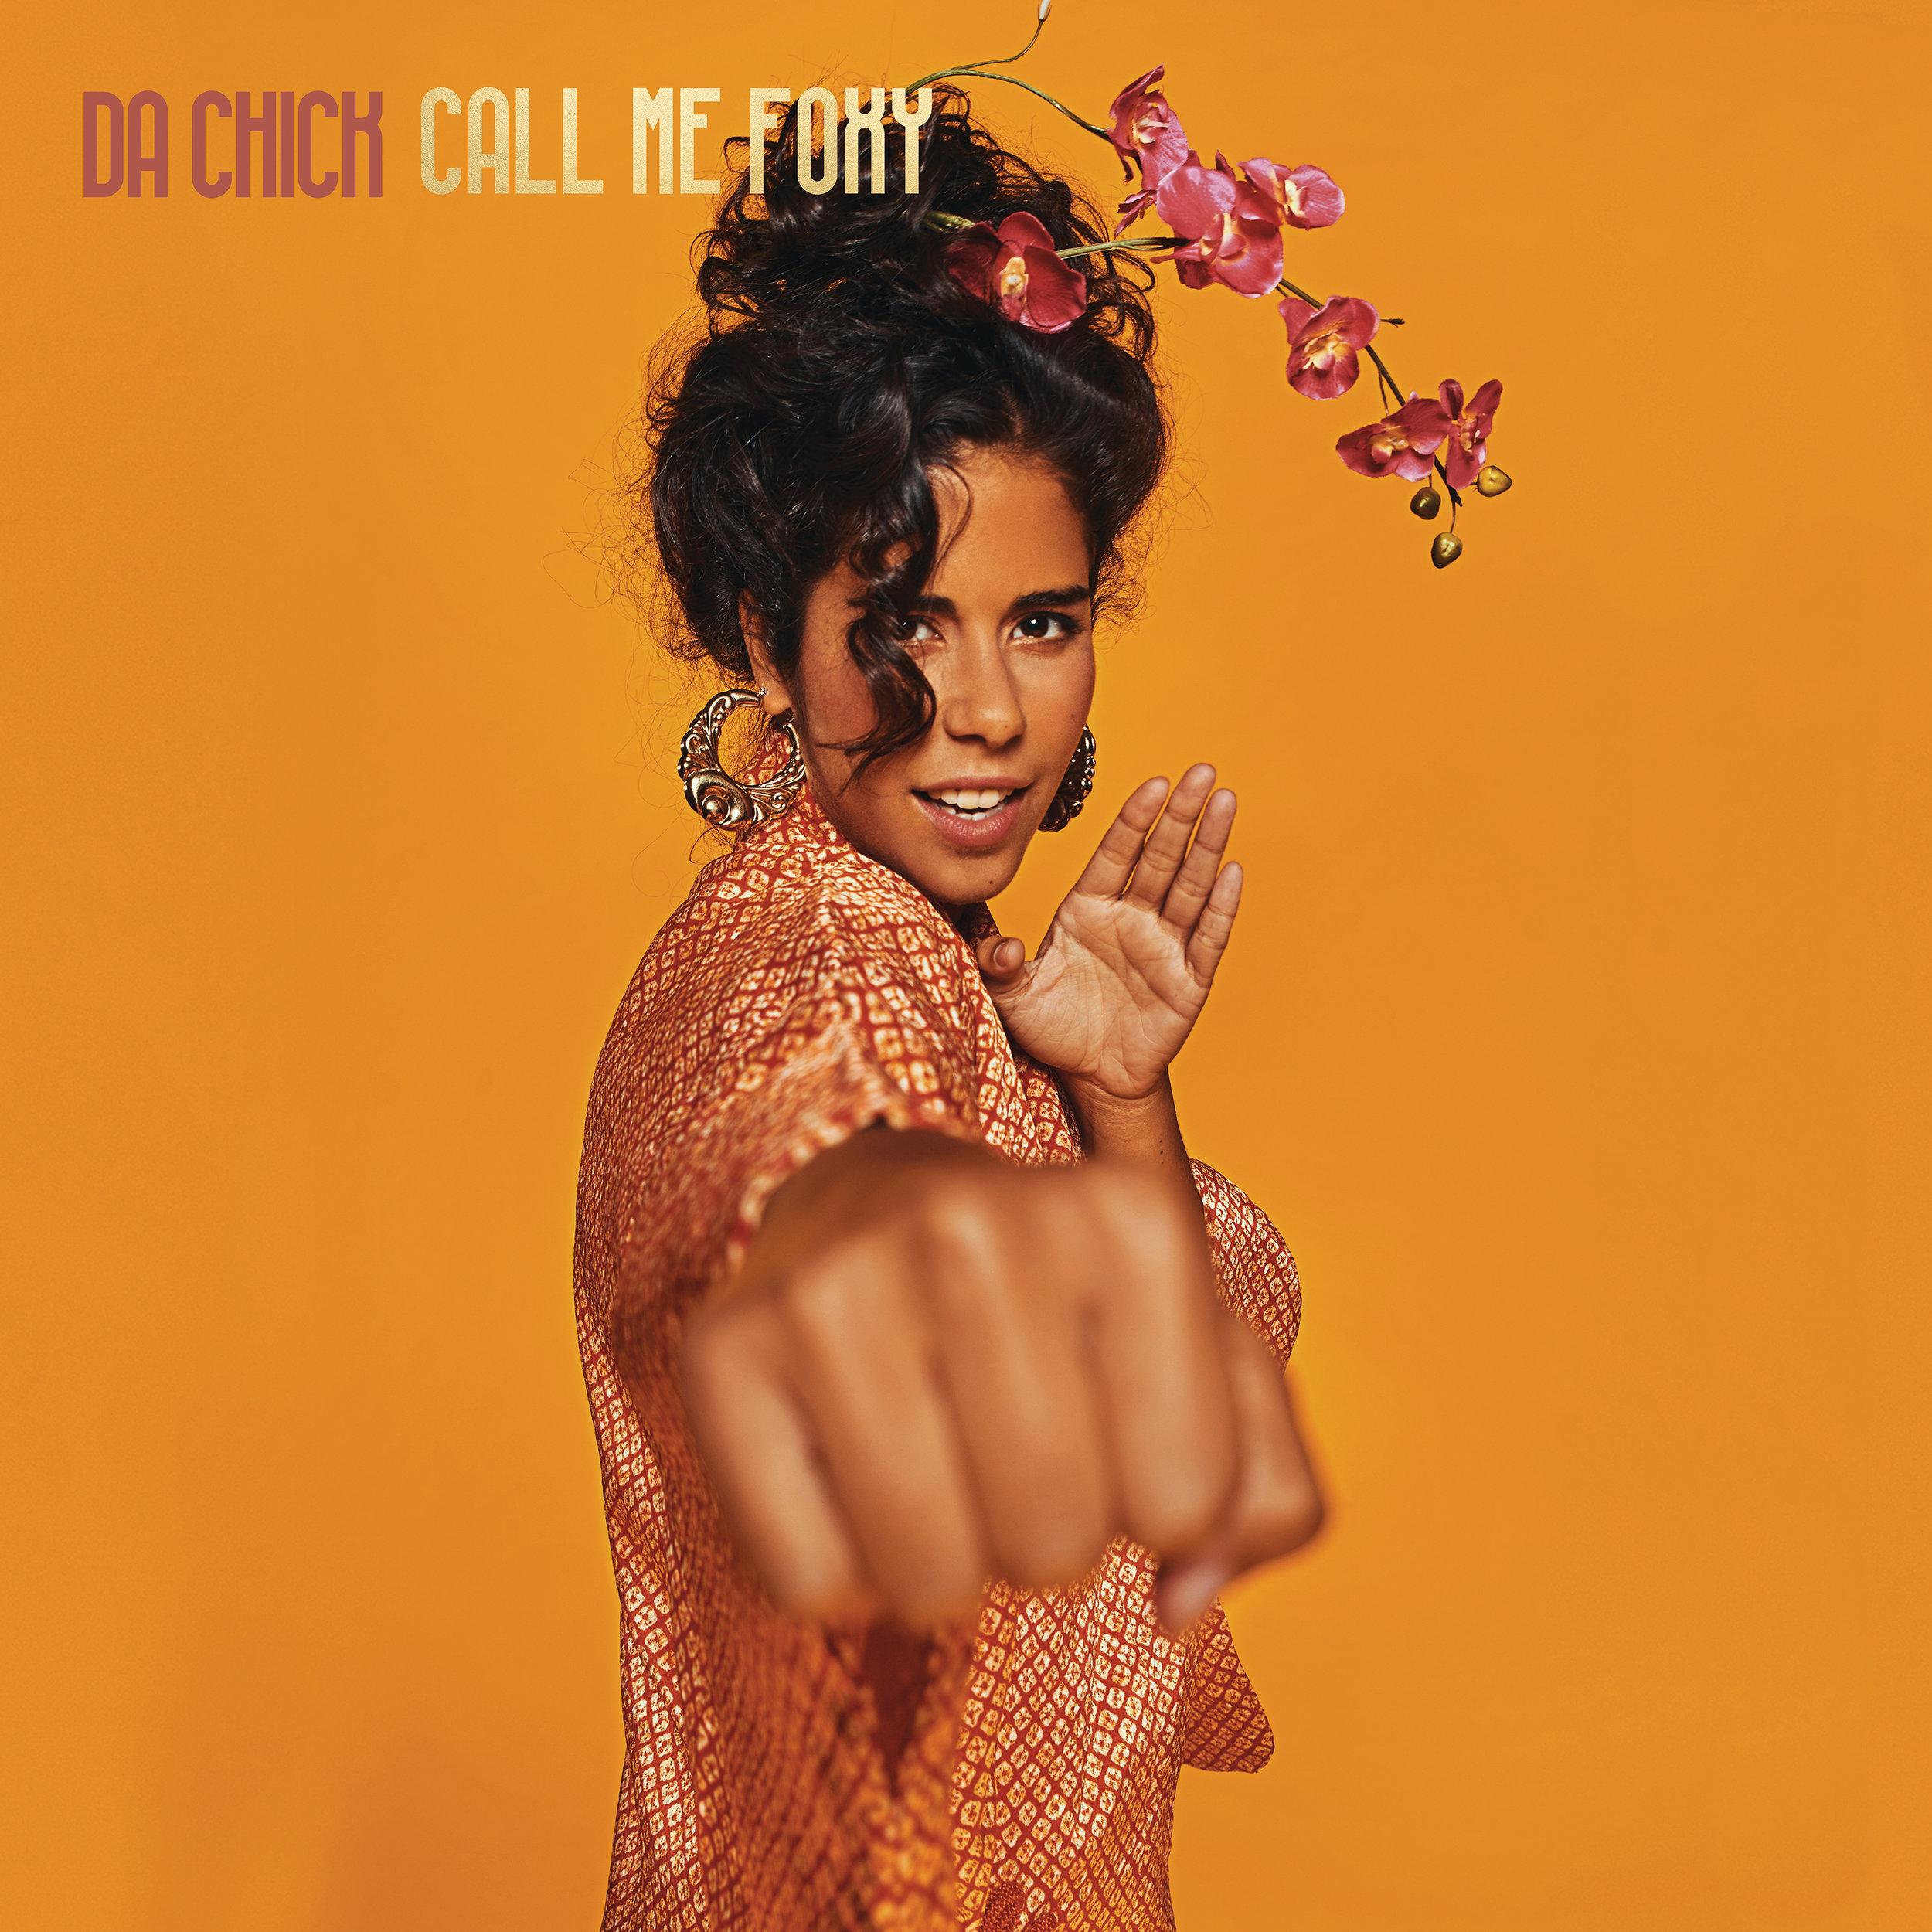 DT074: Da Chick - Call Me Foxy